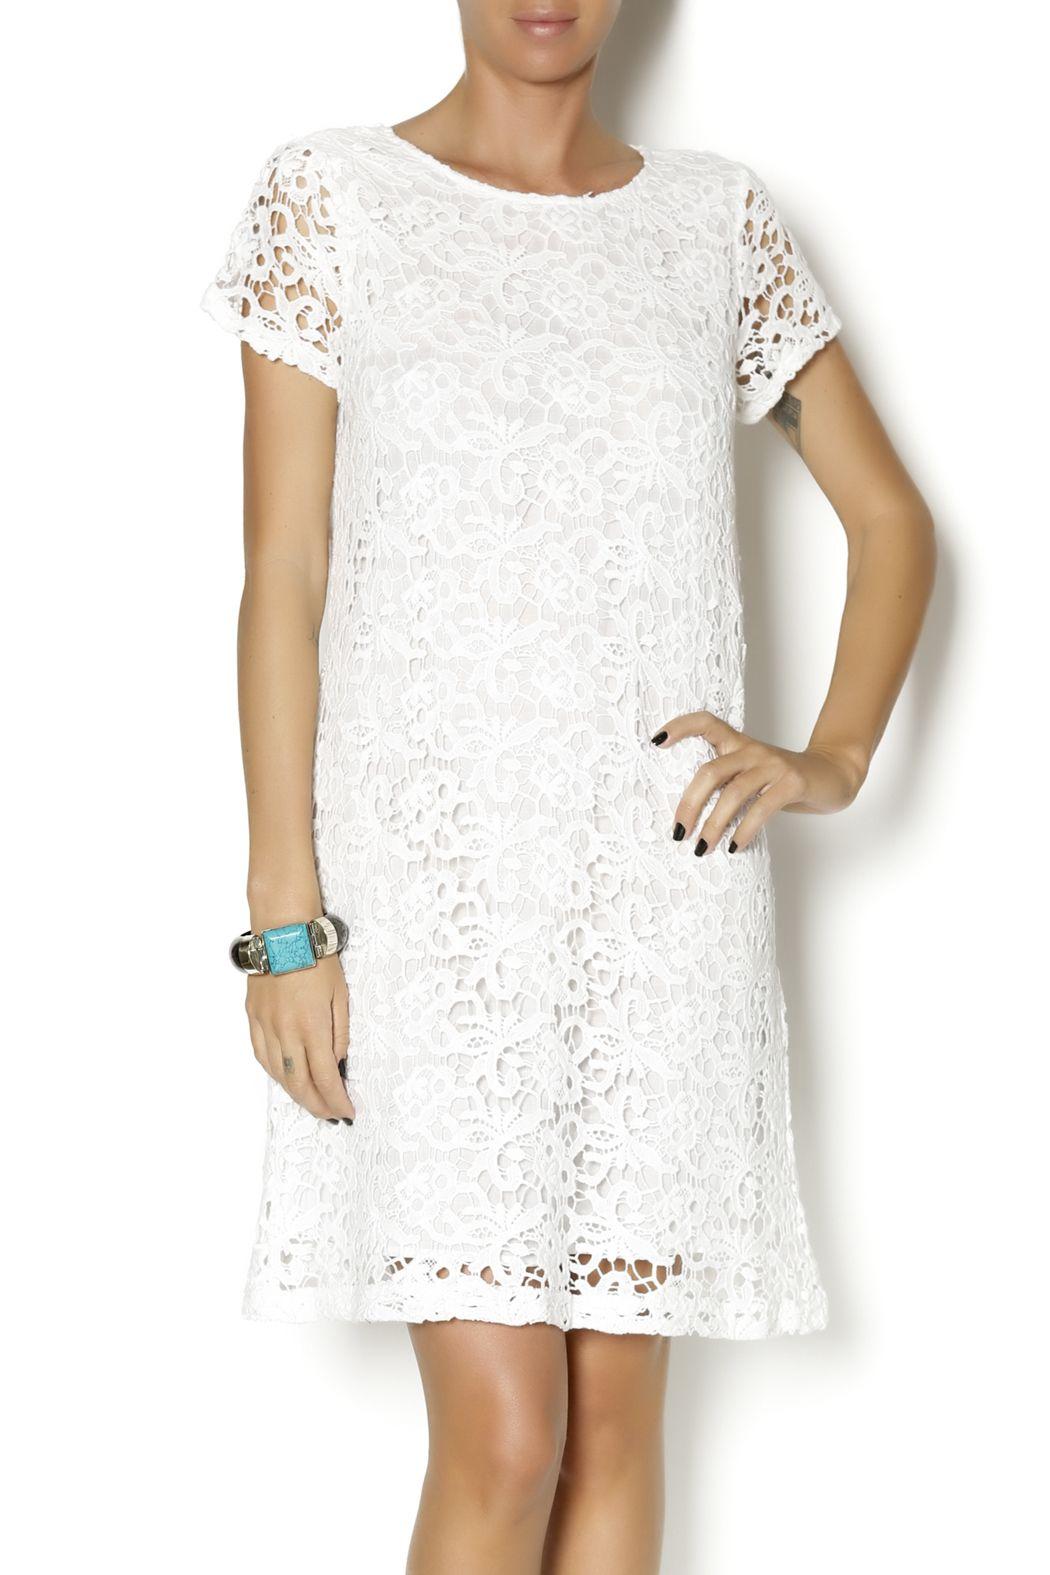 White Lace Dress Lace White Dress Dresses White Lace [ 1575 x 1050 Pixel ]